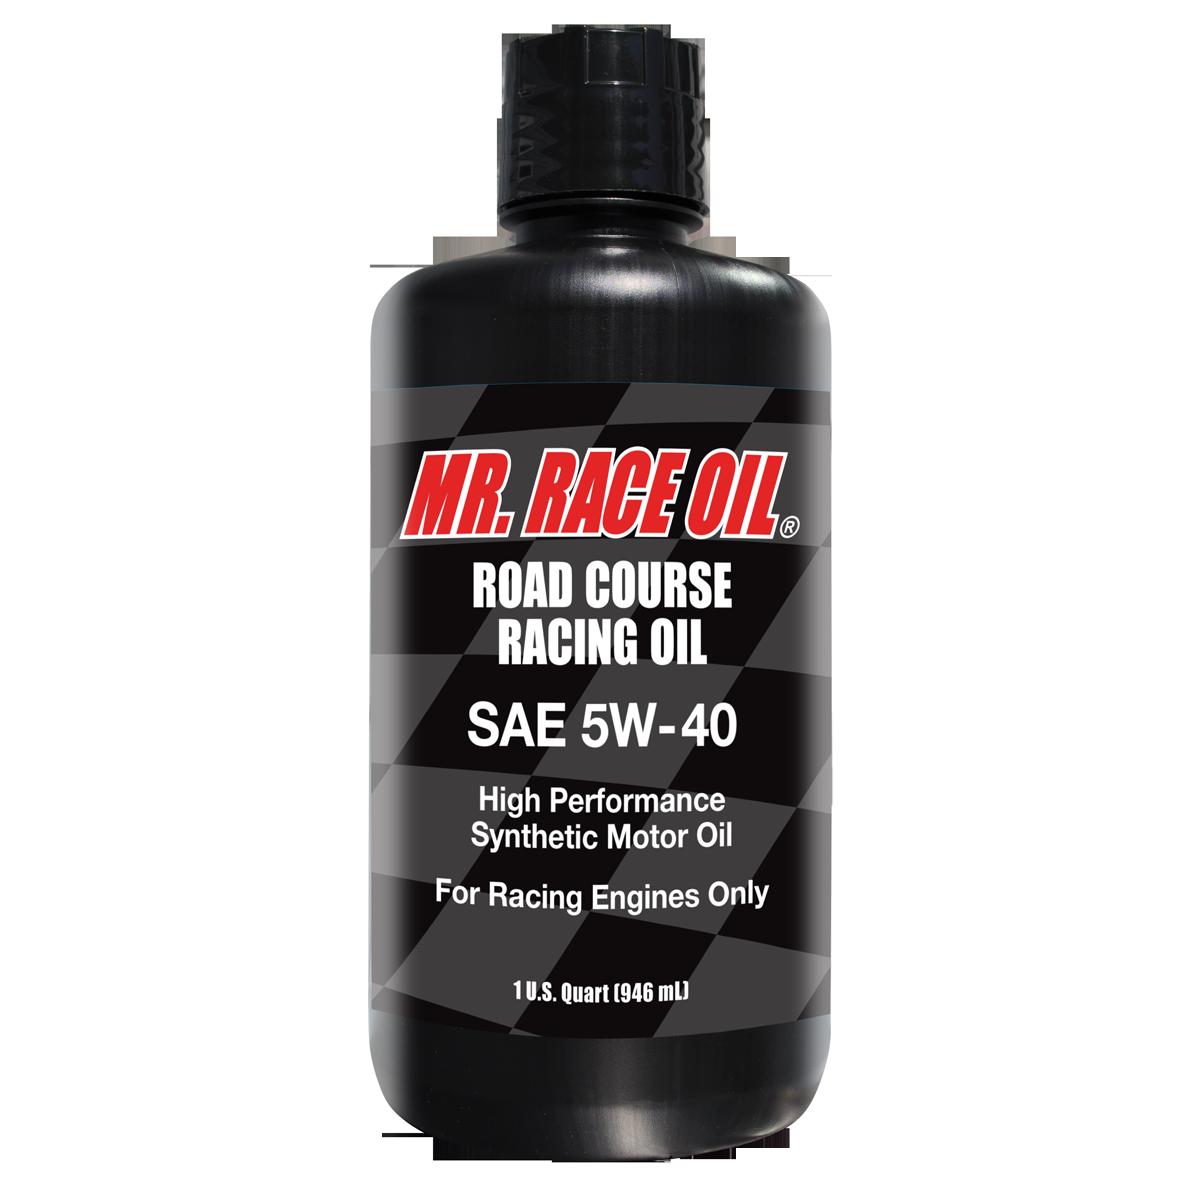 MR. RACE OIL® Road Course Oils